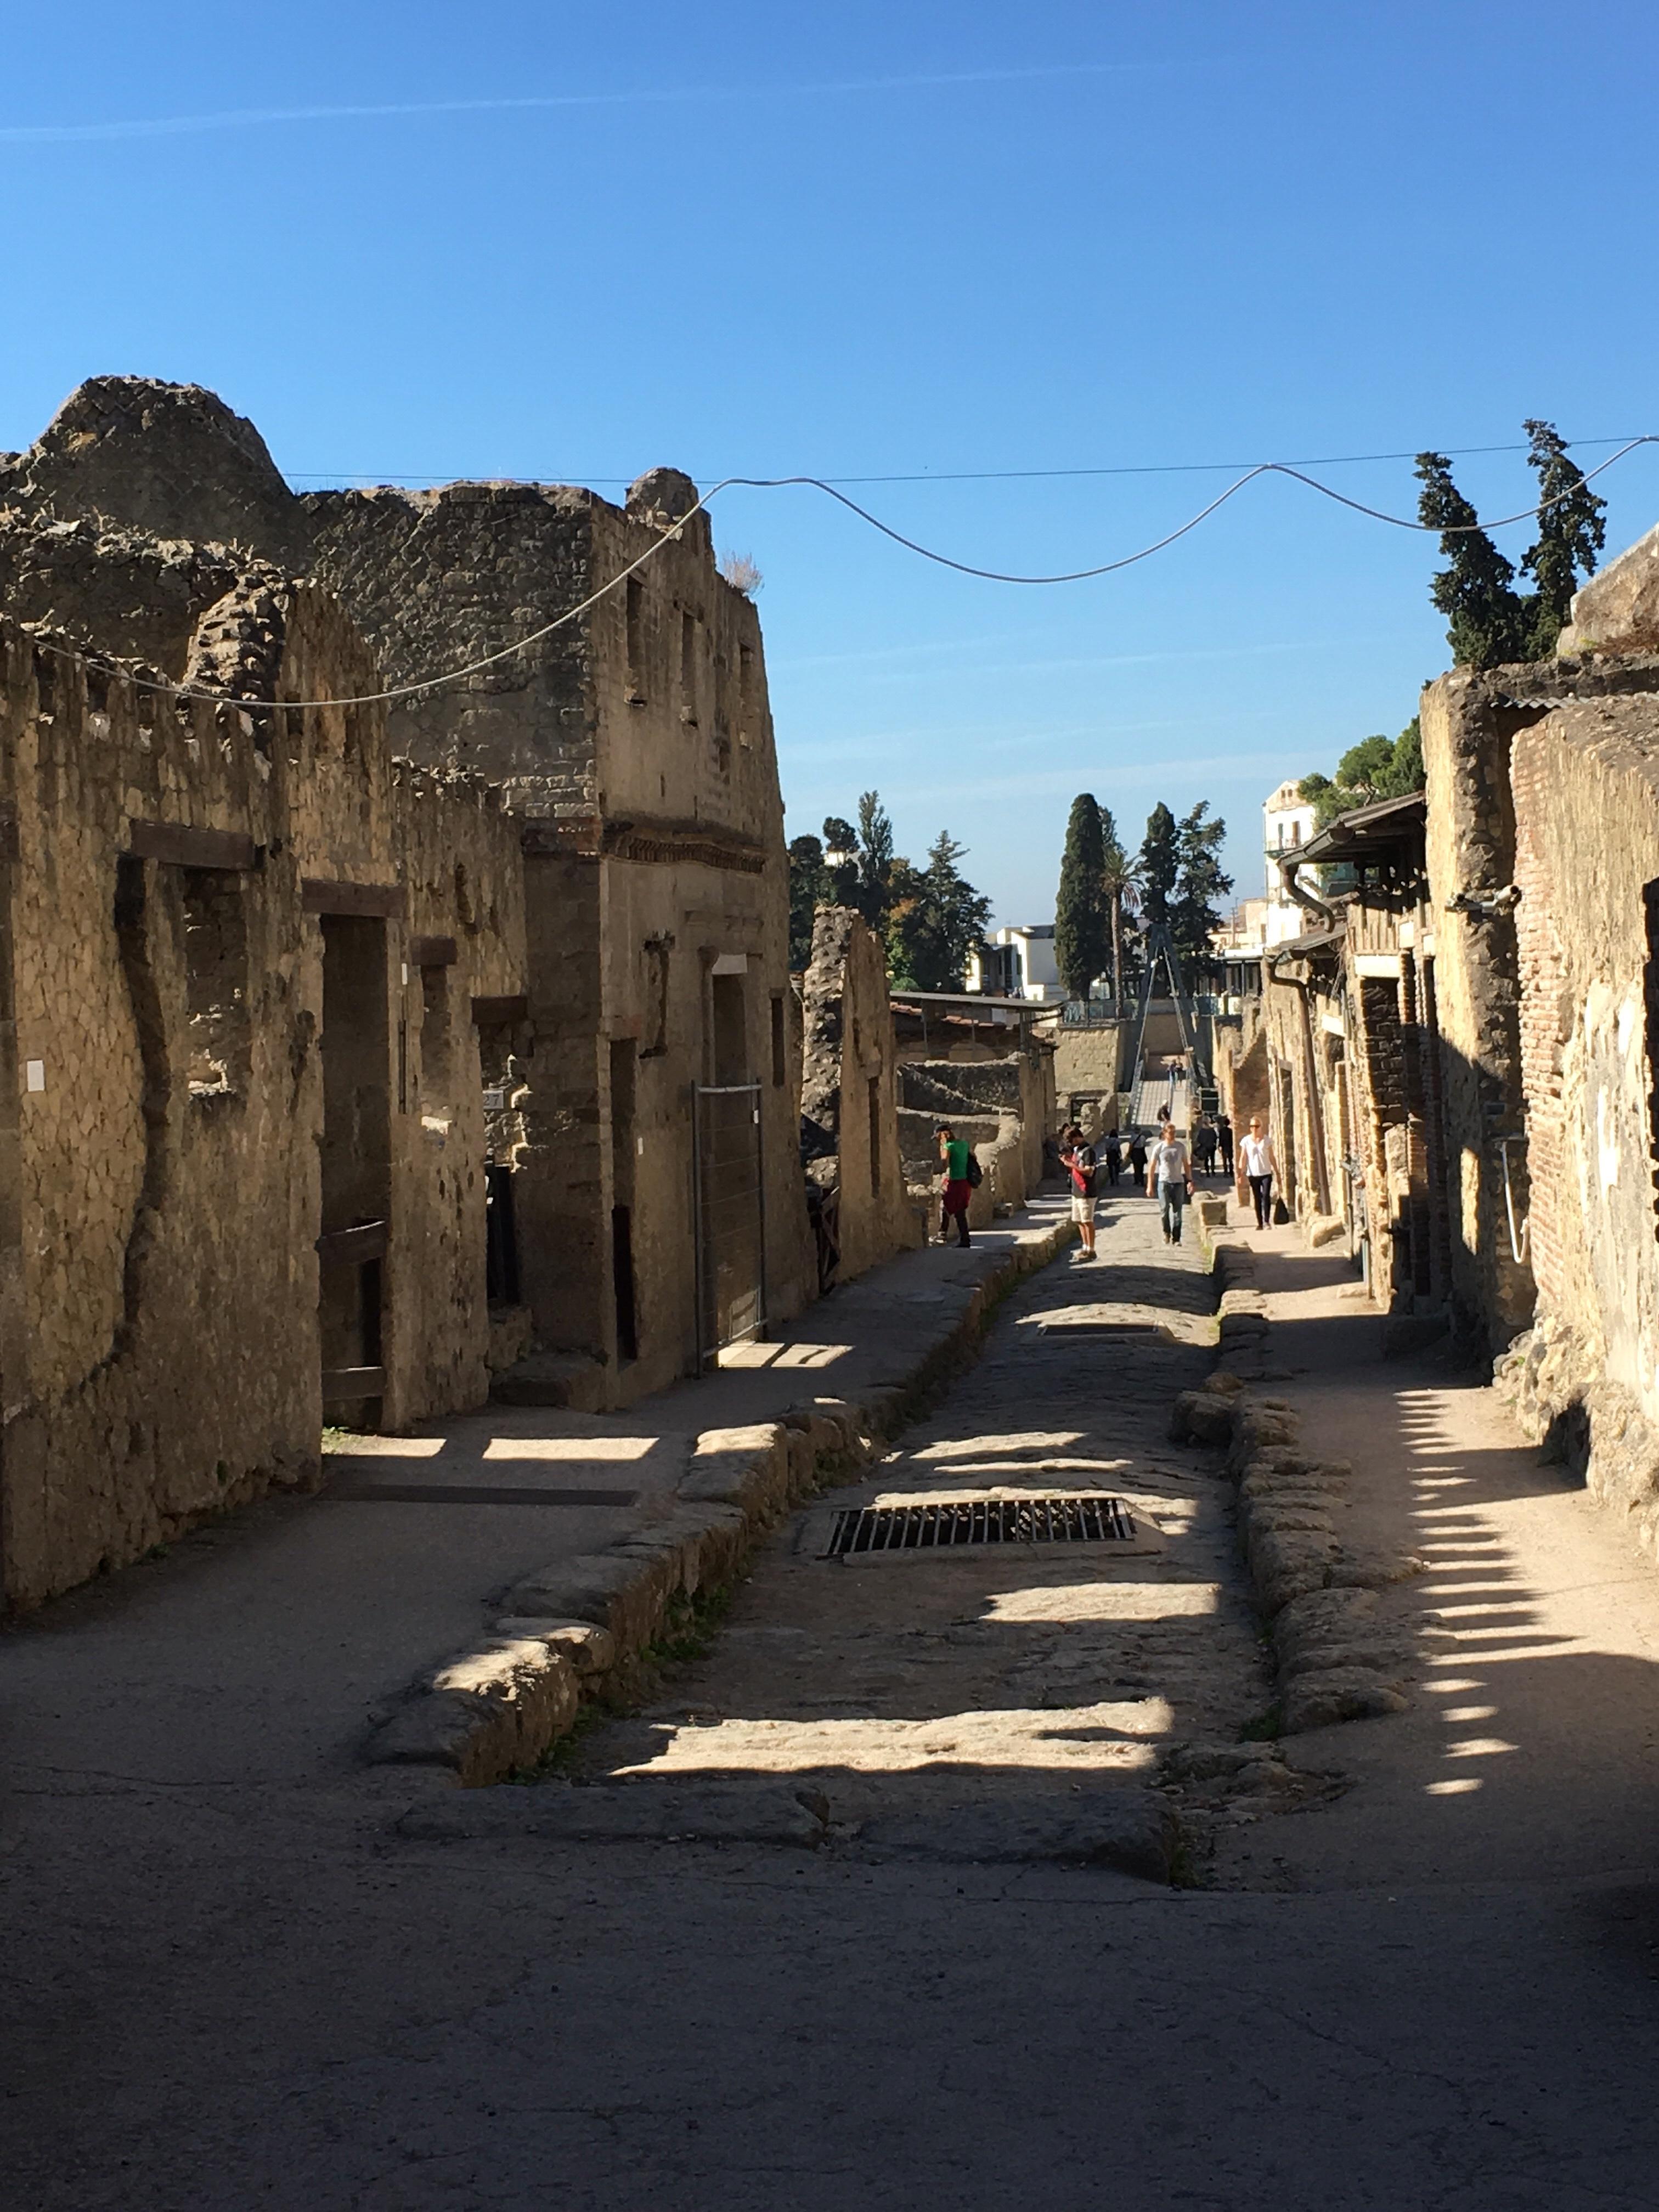 Herculaneum - dig activity 18th c